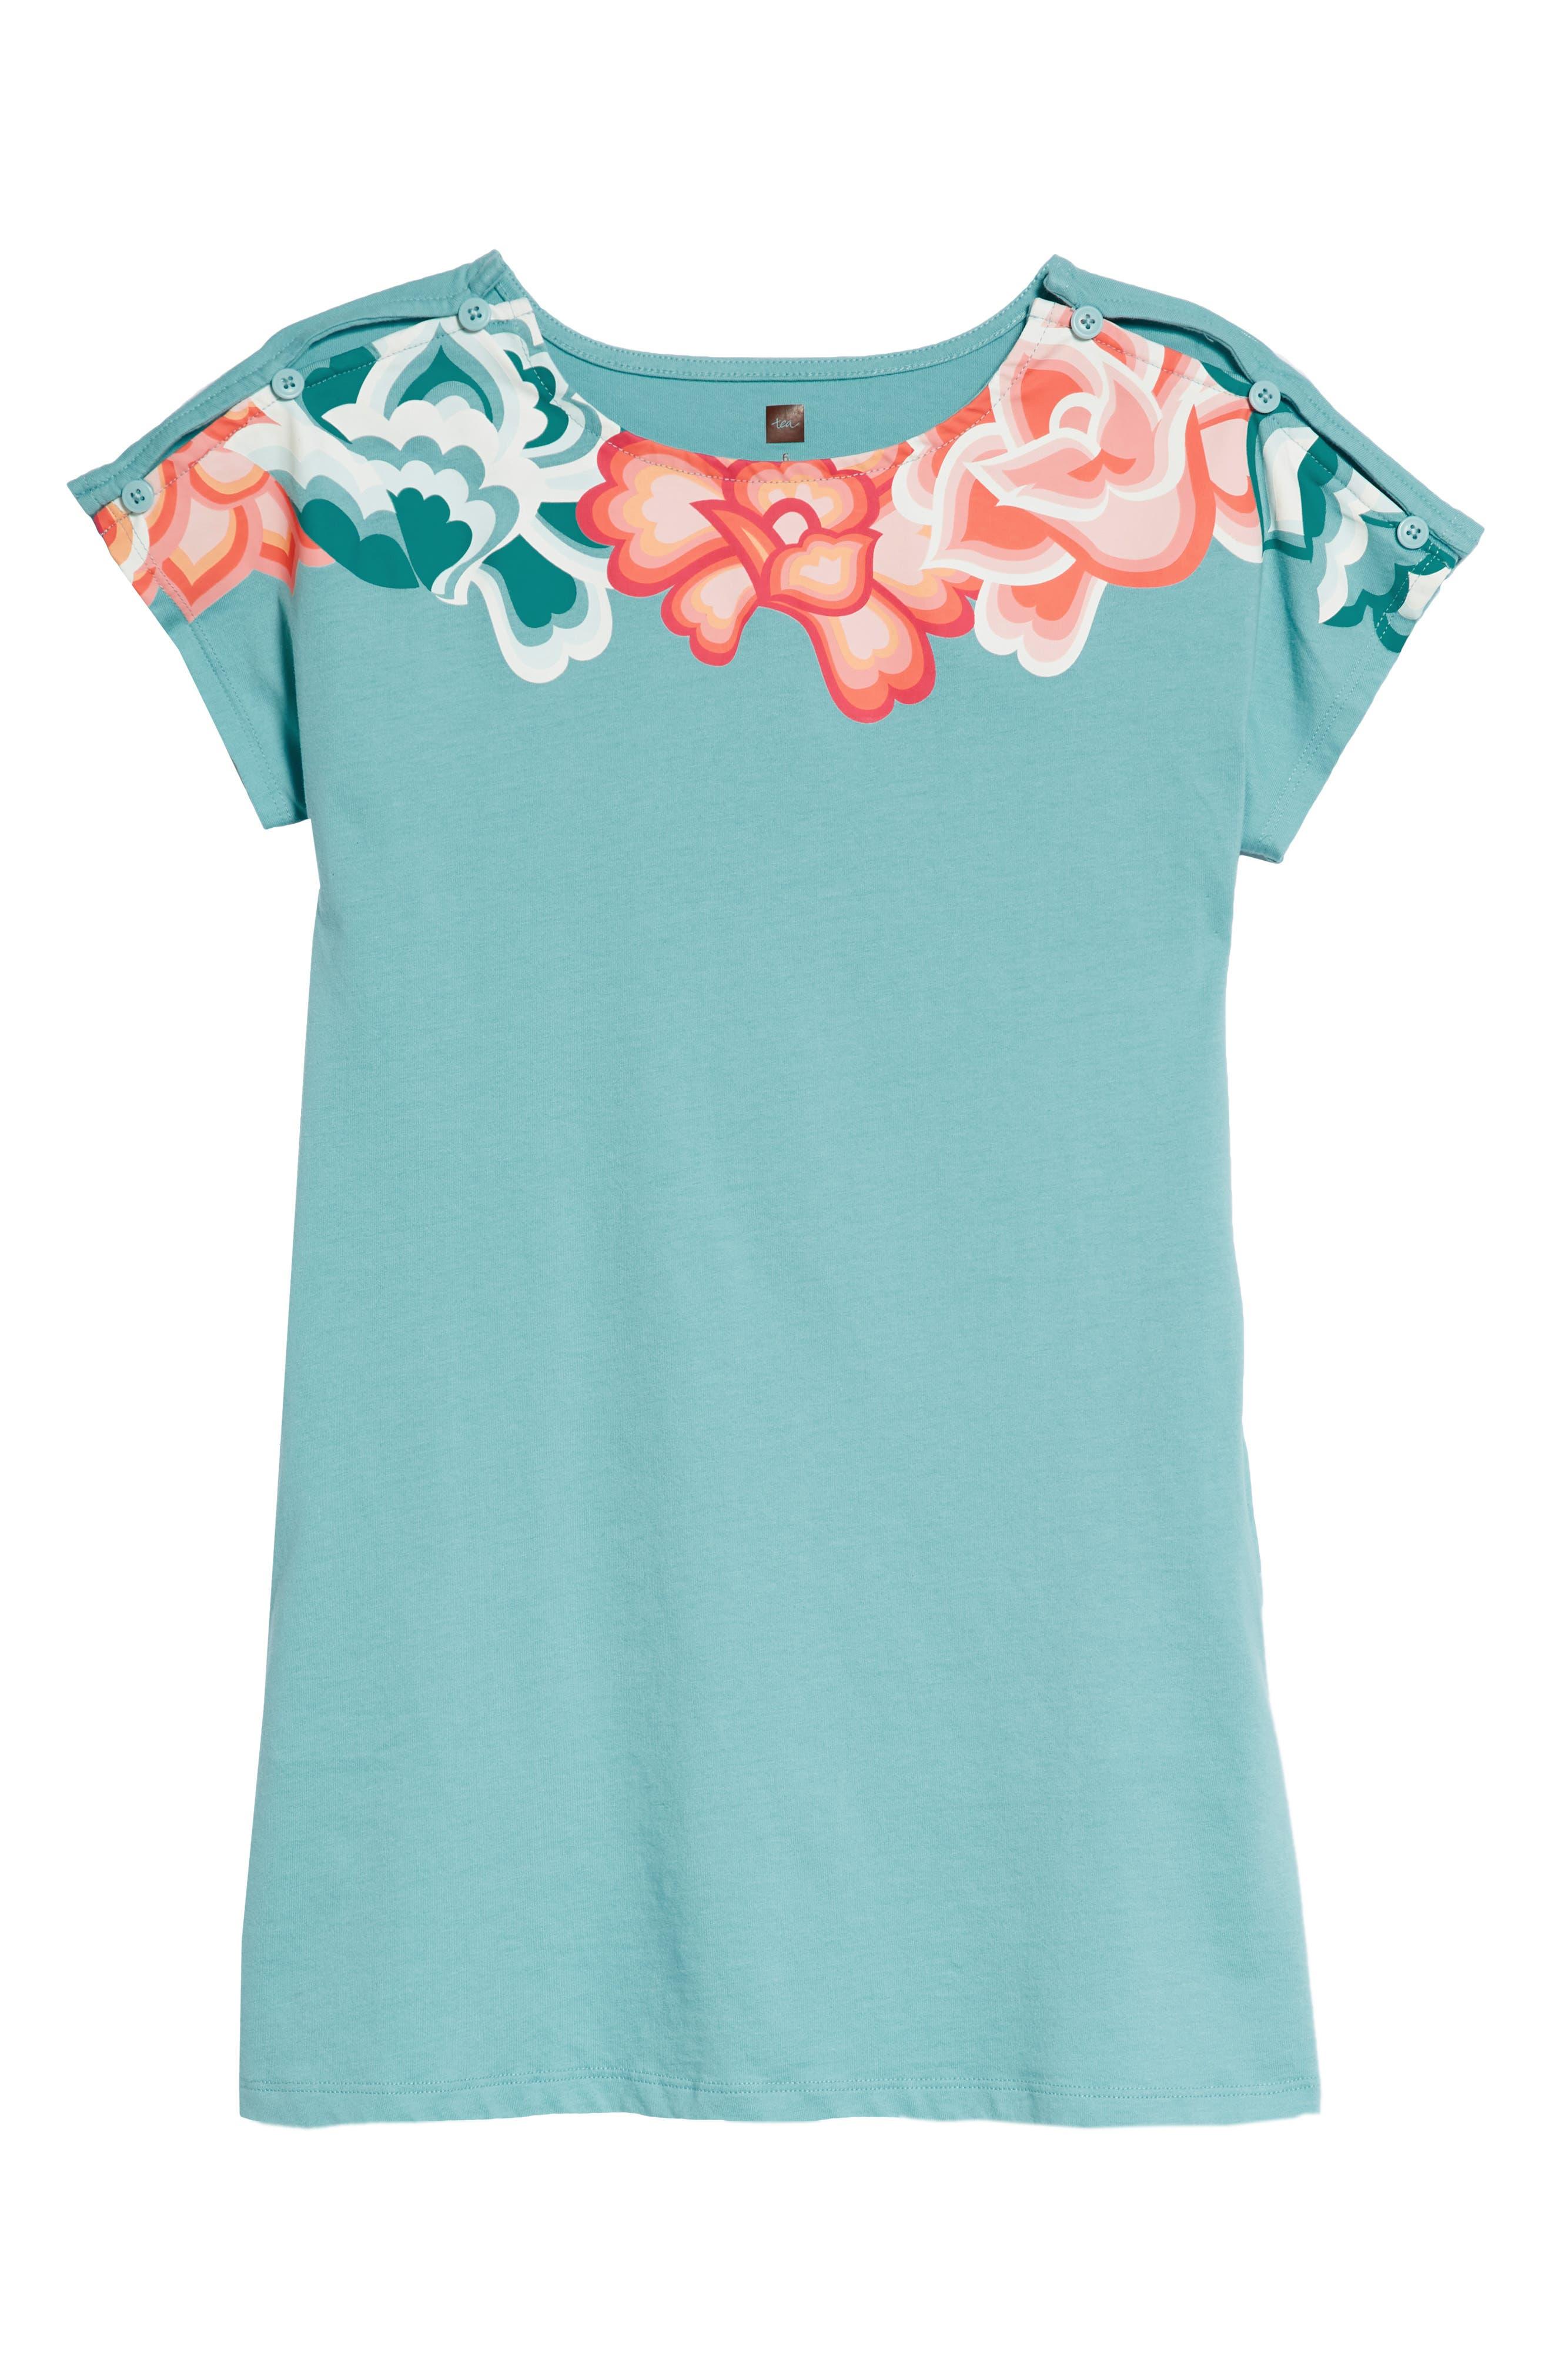 Alternate Image 1 Selected - Tea Collection Button Shoulder T-Shirt Dress (Toddler Girls, Little Girls & Big Girls)